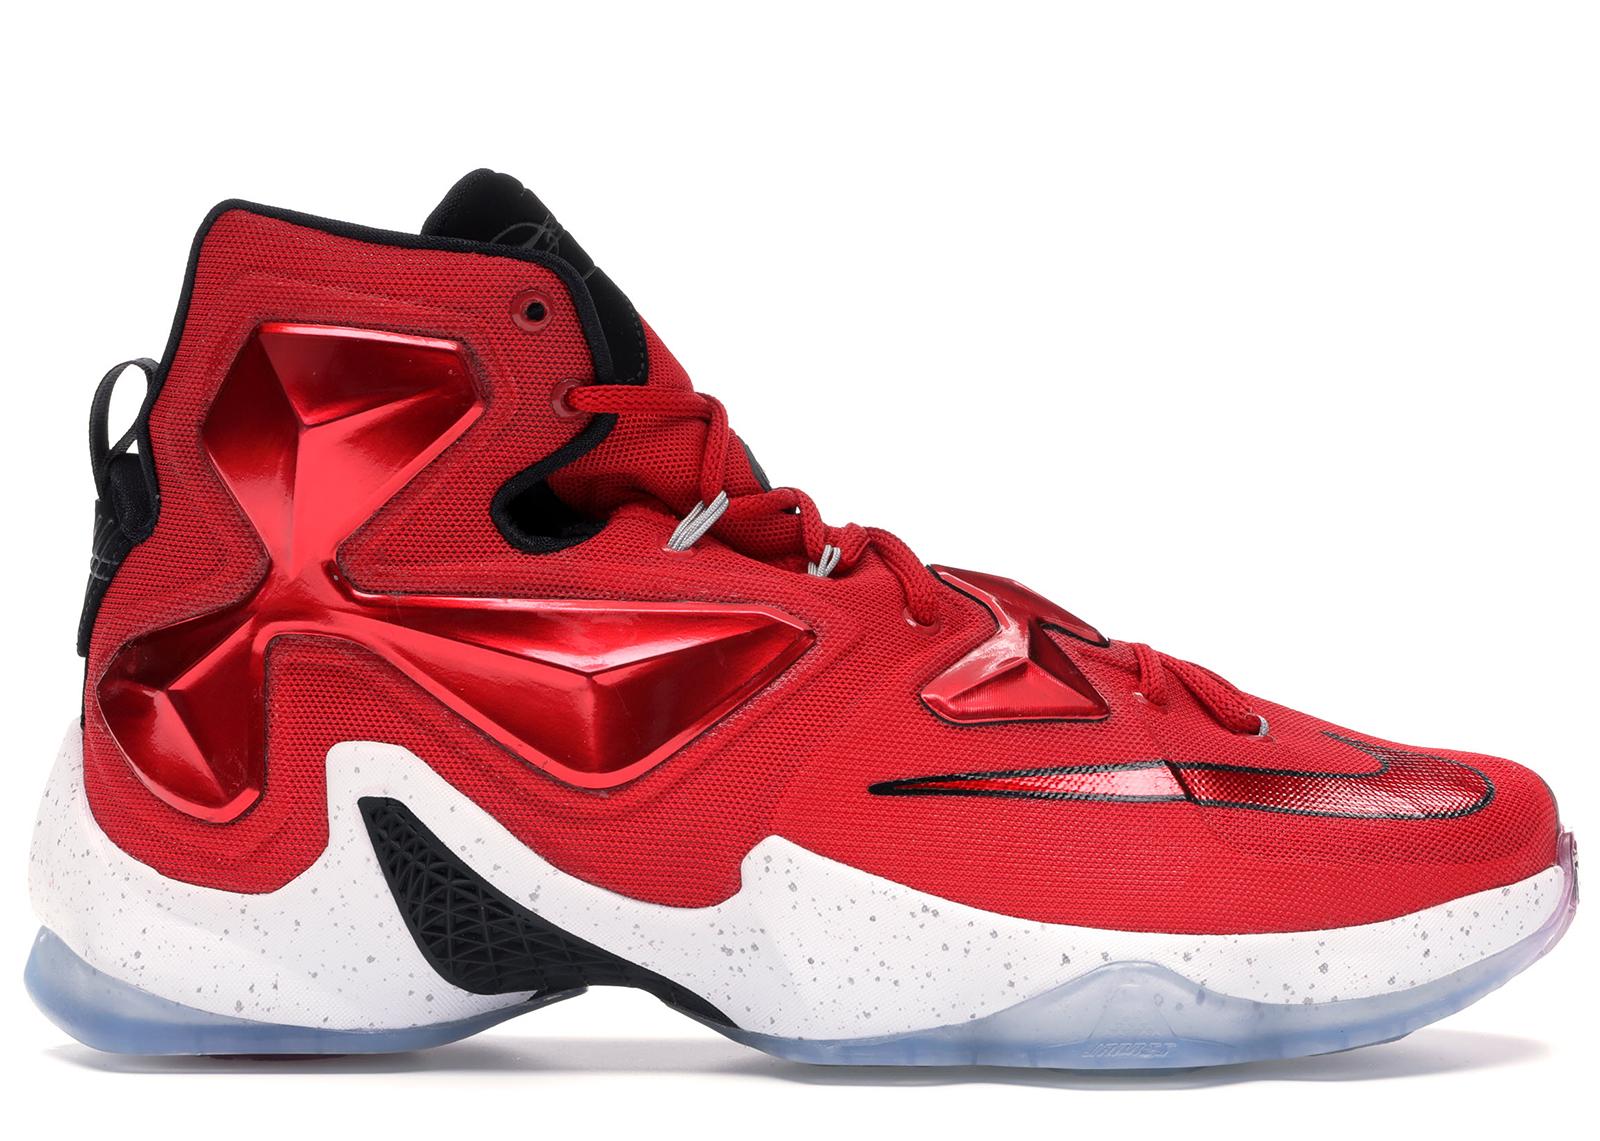 LeBron James Signature Sneaker